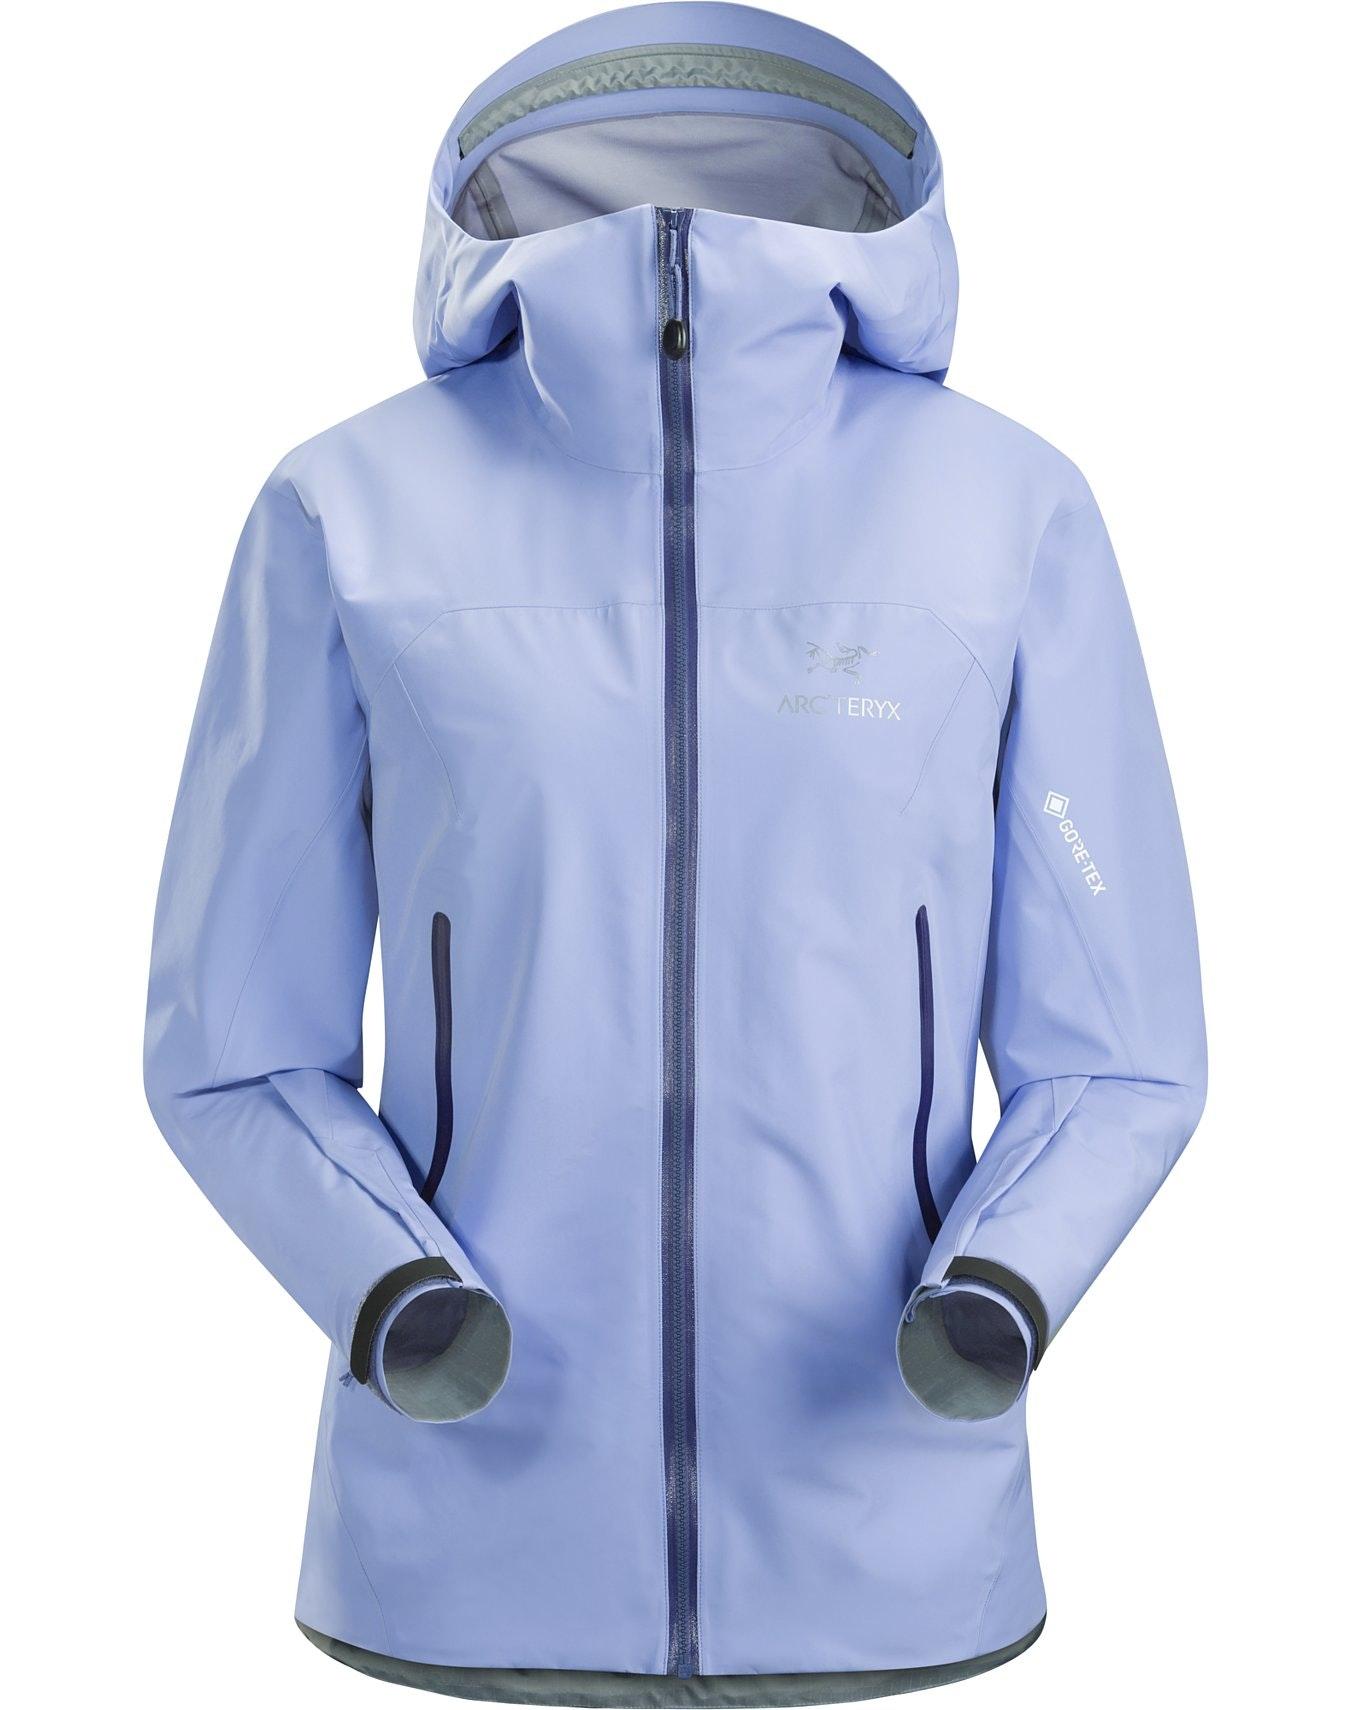 performance sportswear the cheapest super specials Zeta LT Jacket Women's